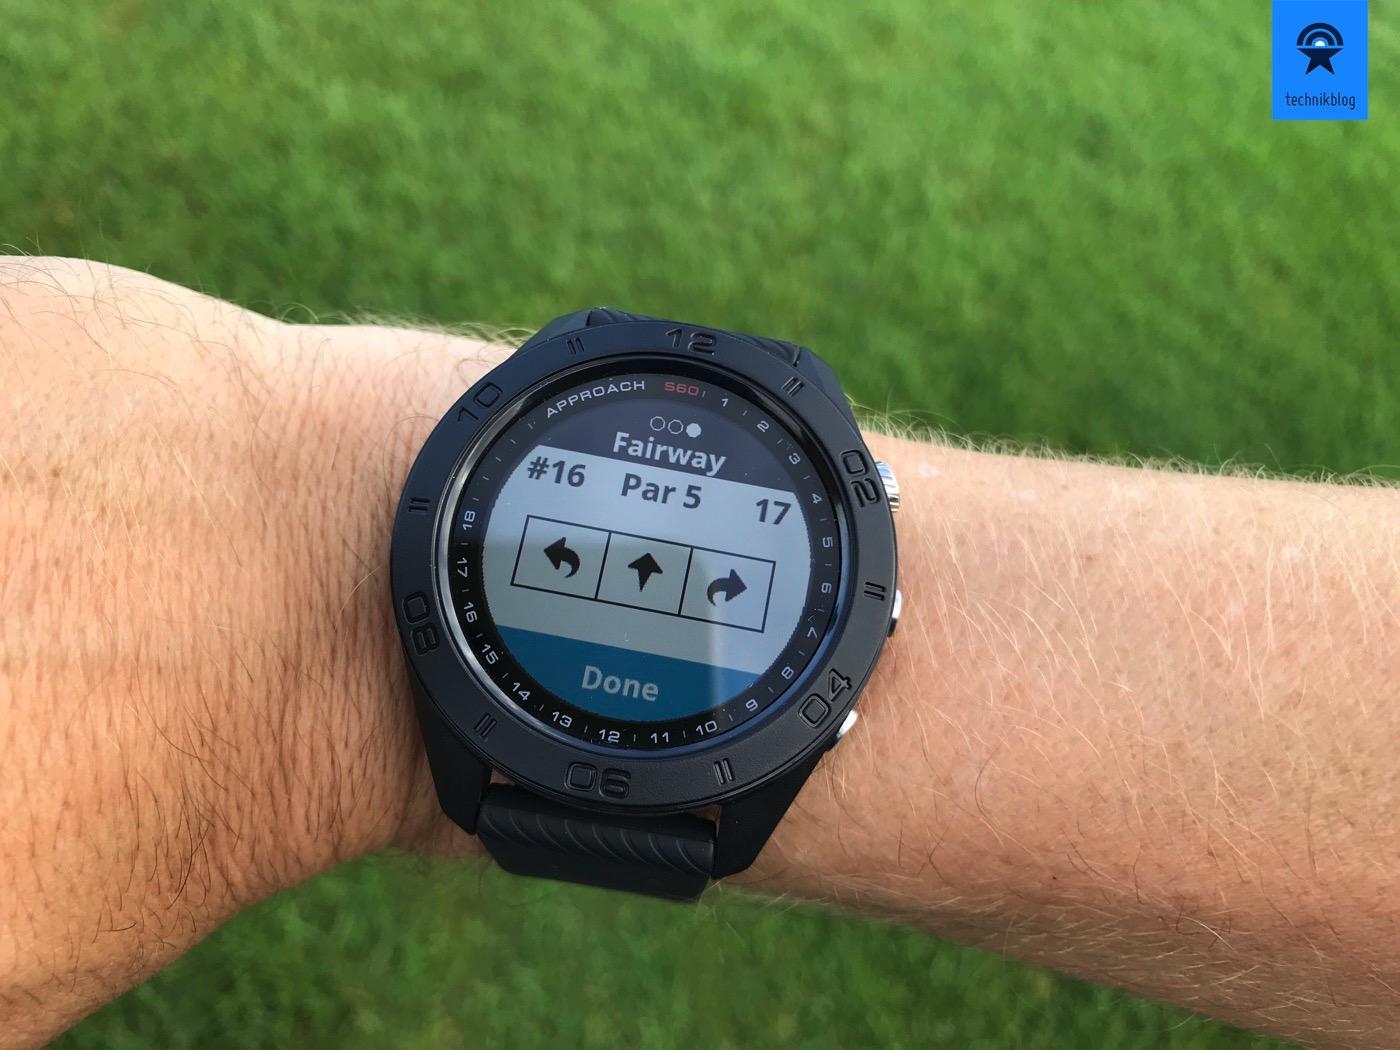 Golf Entfernungsmesser Apple Watch : Testbericht: garmin approach s60 u2013 hast du noch sex oder spielst